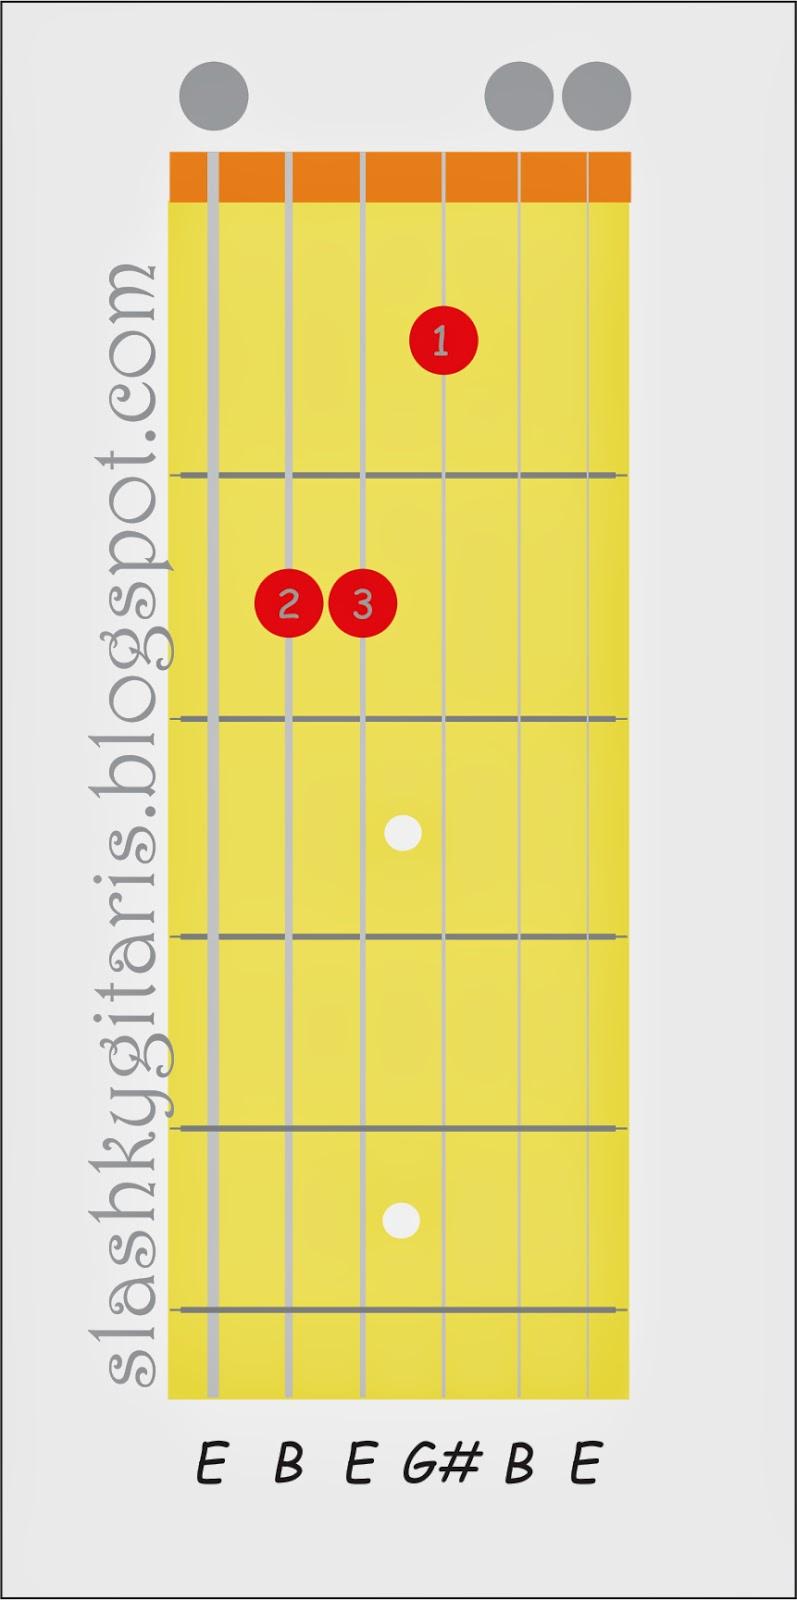 kunci gitar, chord gitar, kunci gitar peterpan, kunci gitar ungu, kunci gitar last child, kunci dasar gitar, cord gitar, gitar akustik, cara bermain gitar, kunci gitar armada, kord gitar, belajar gitar, E mayor